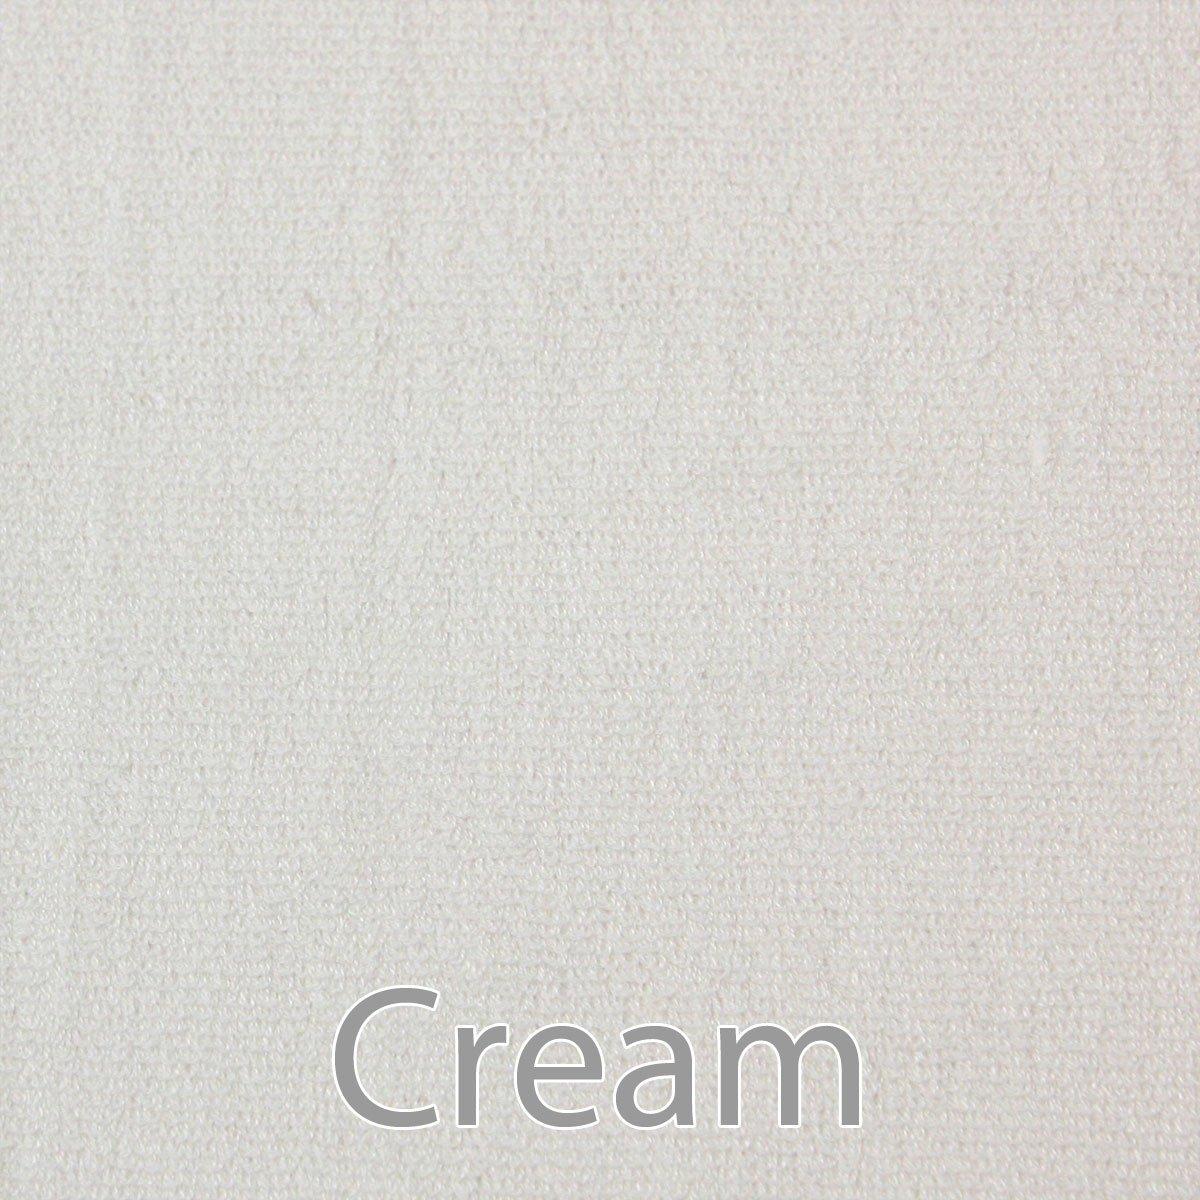 Luxury Spa Ultra Soft 70% Rayon Bamboo 30% Organic Cotton Blend Bath Towel - 2pc - Cream